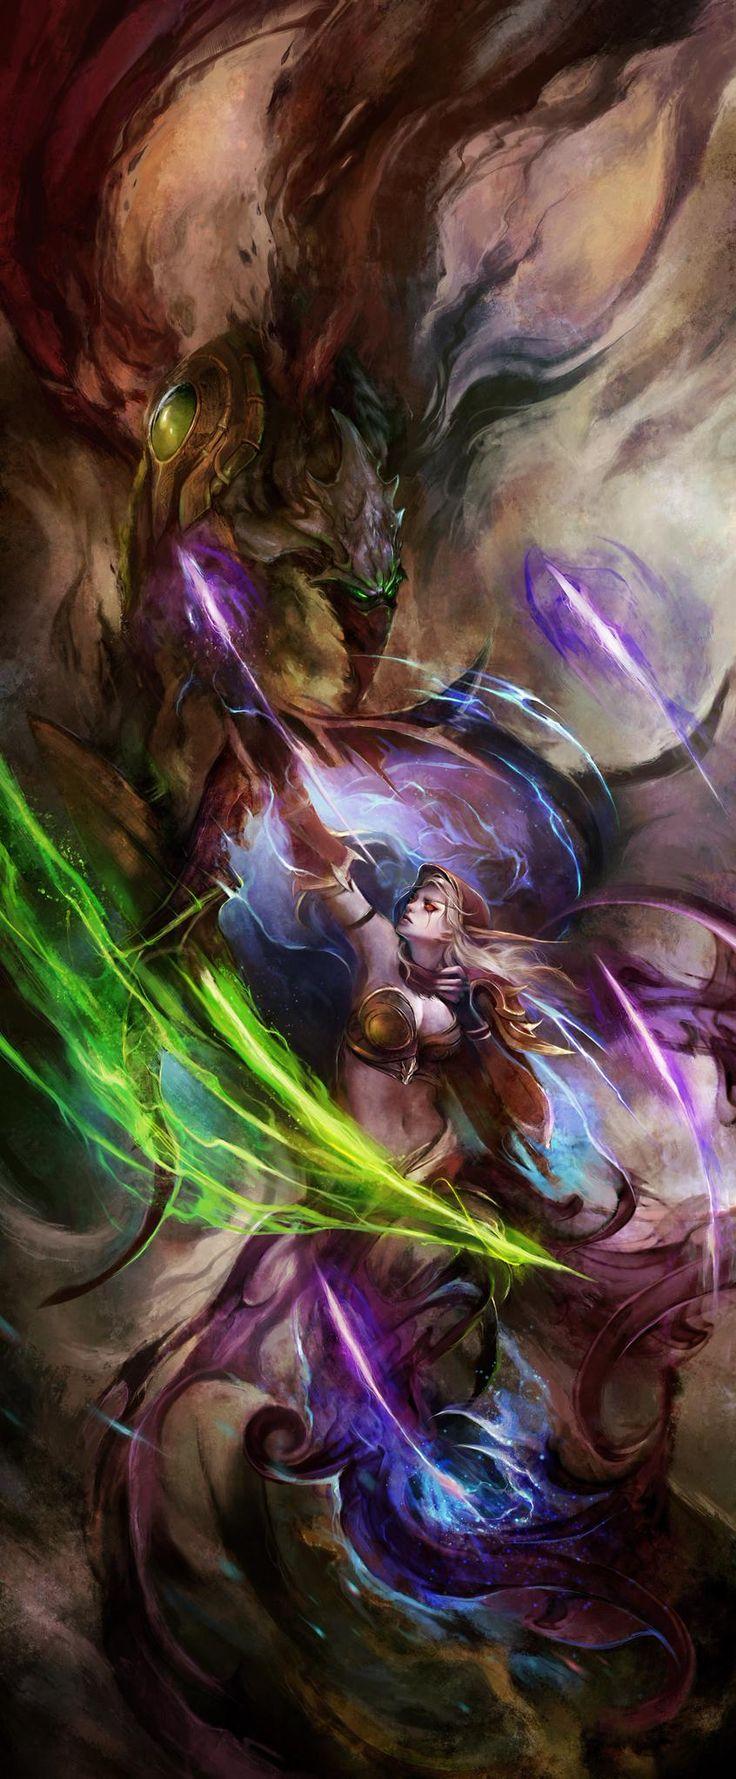 Heroes of the storm by Muju - Fantasy - Fashion - Fine Art - Conceptual - Comic - Illustration - Warrior - Gatekeeper